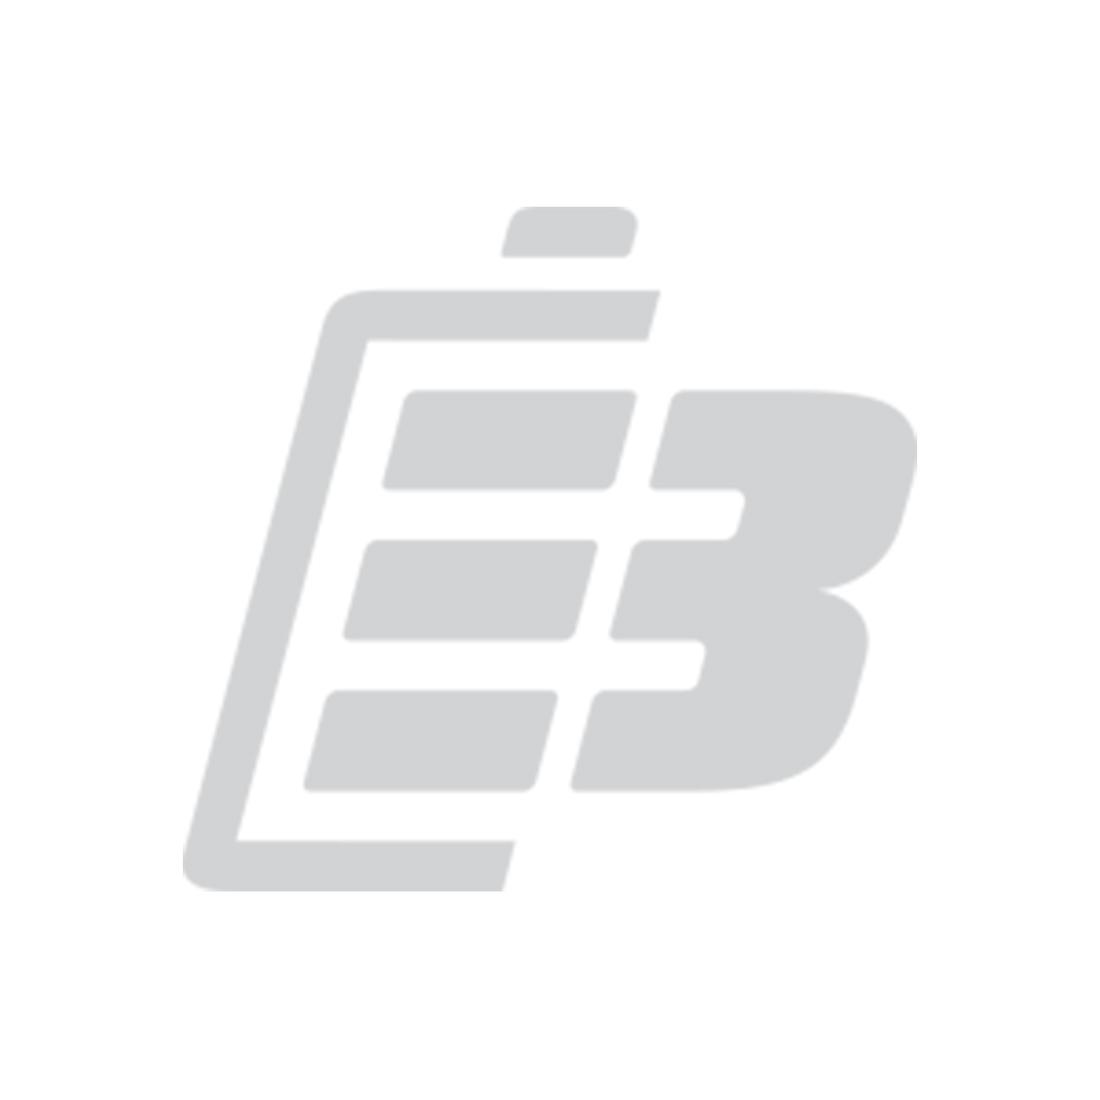 Fenix LR35R LED Flashlight